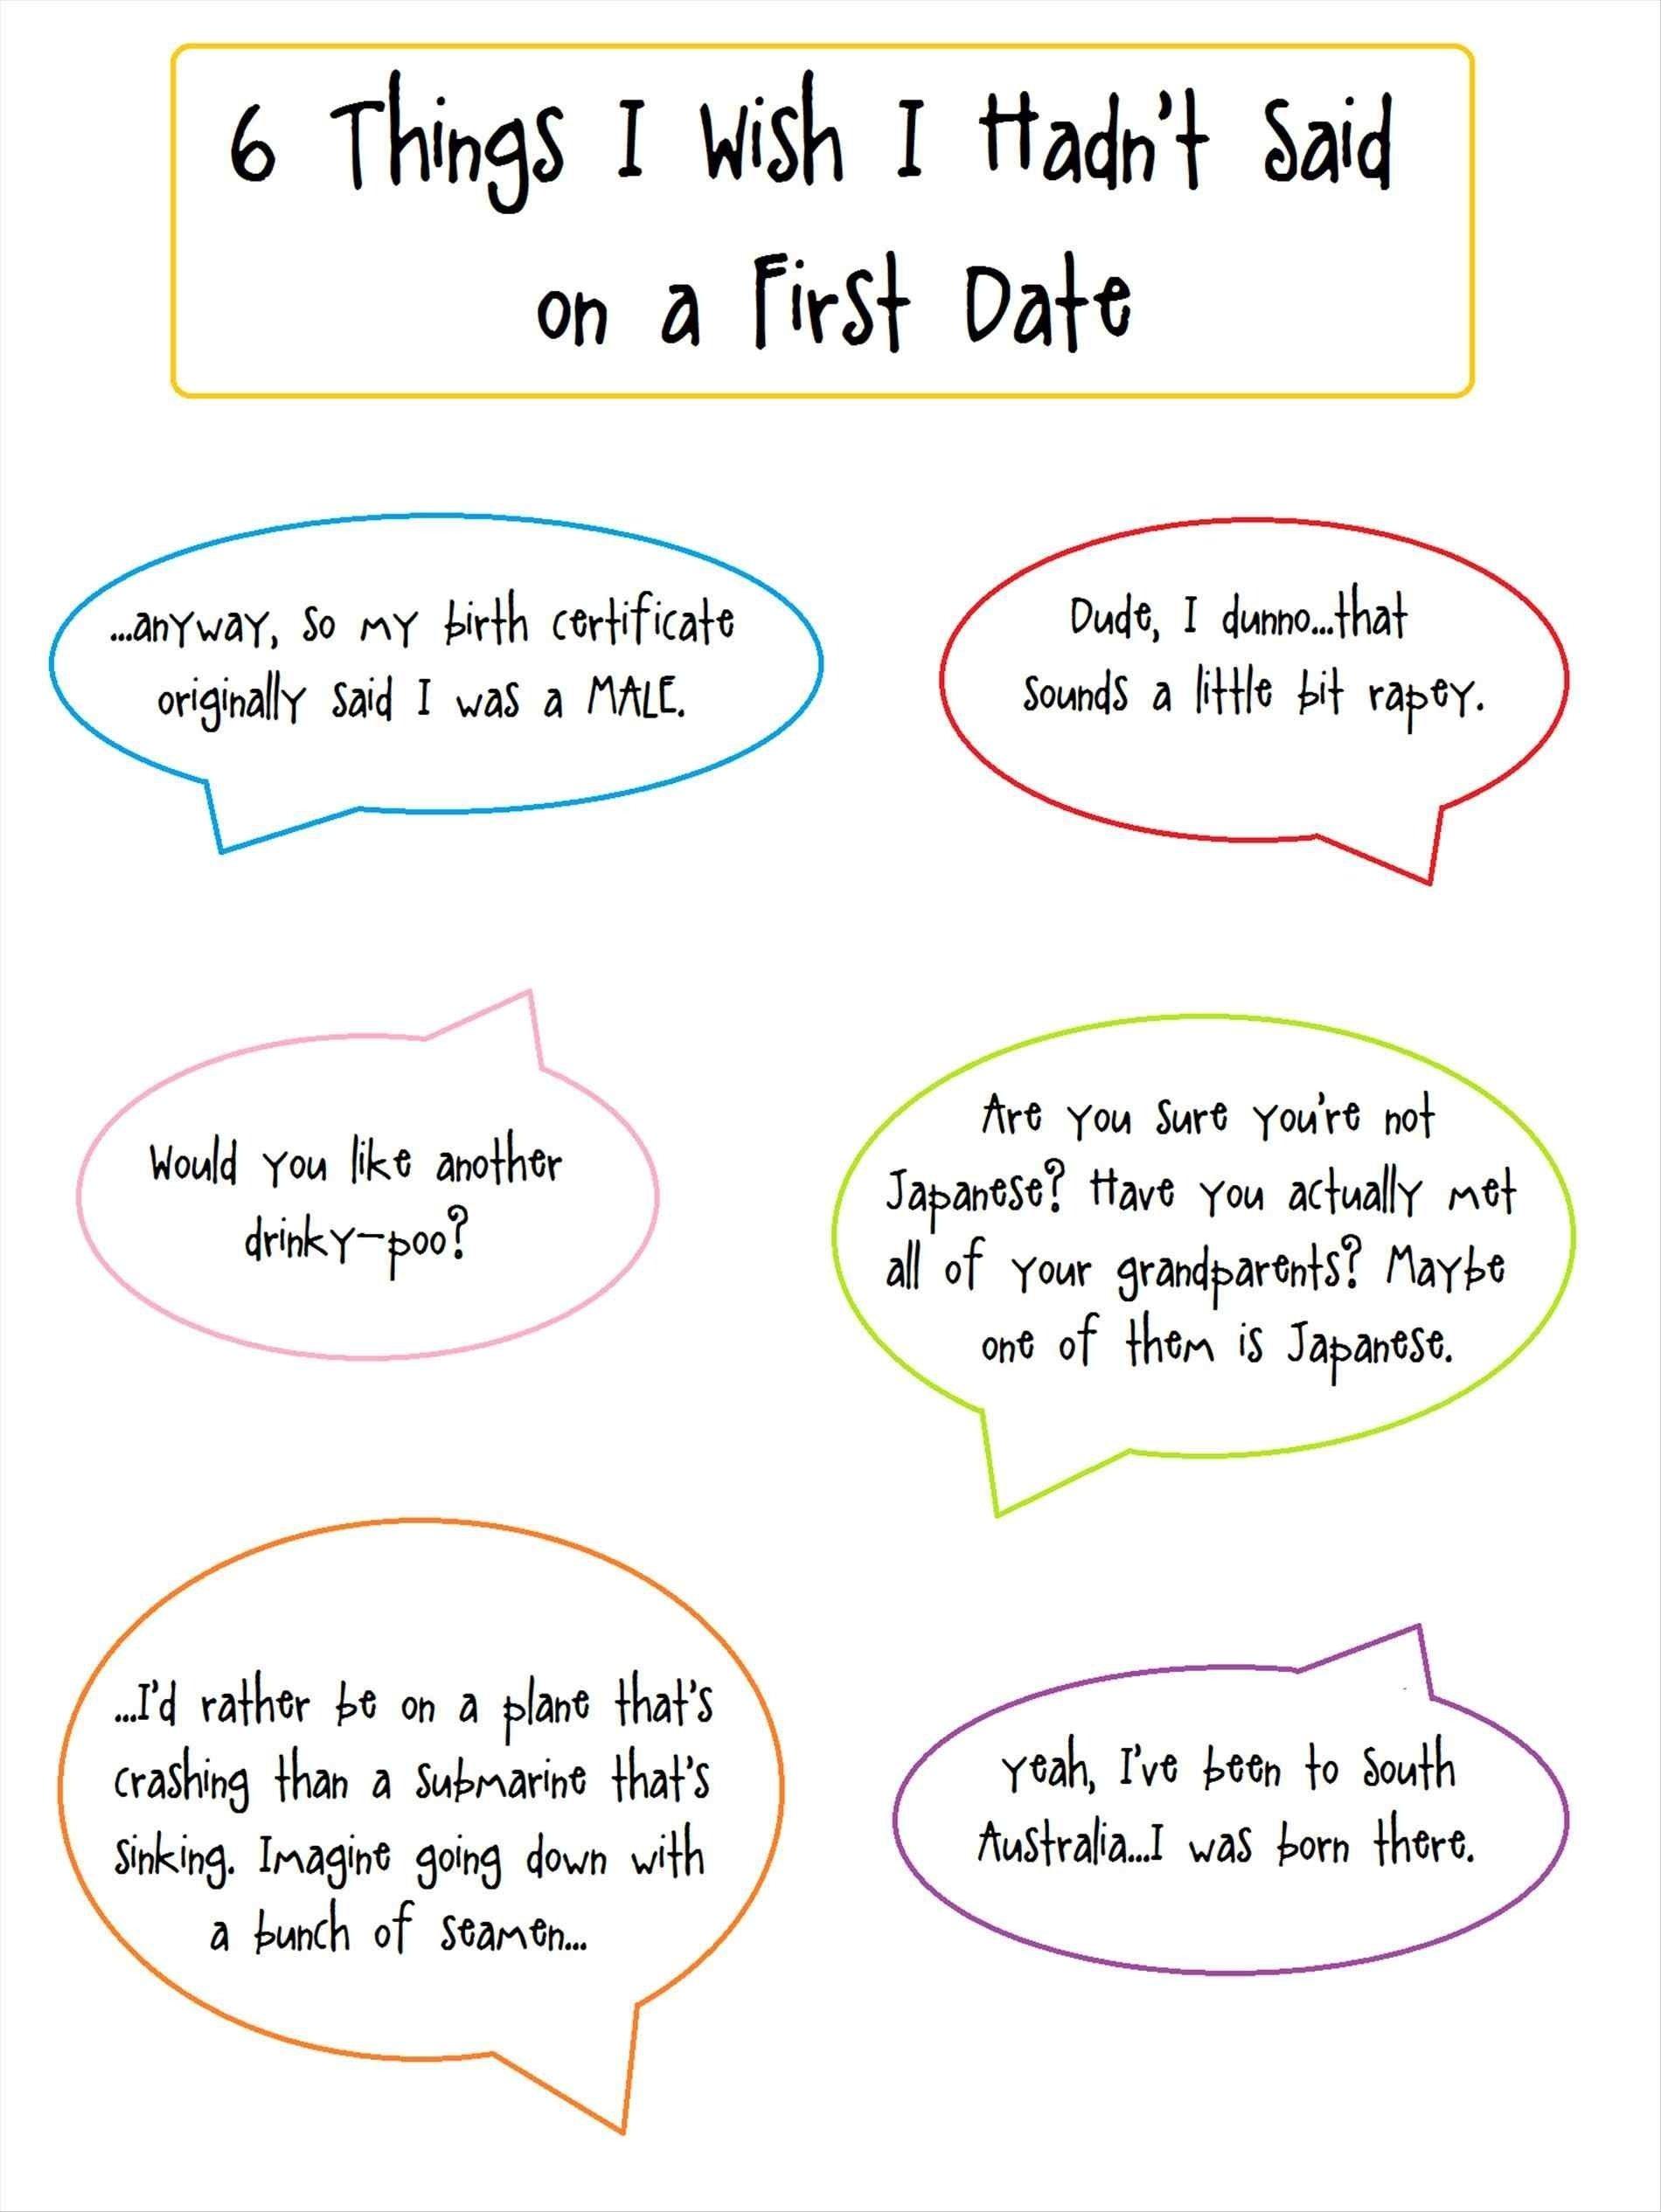 10 Famous Cheap Date Ideas For Winter ideas tumblr on pinterest fun cheap free unique cute winter date 1